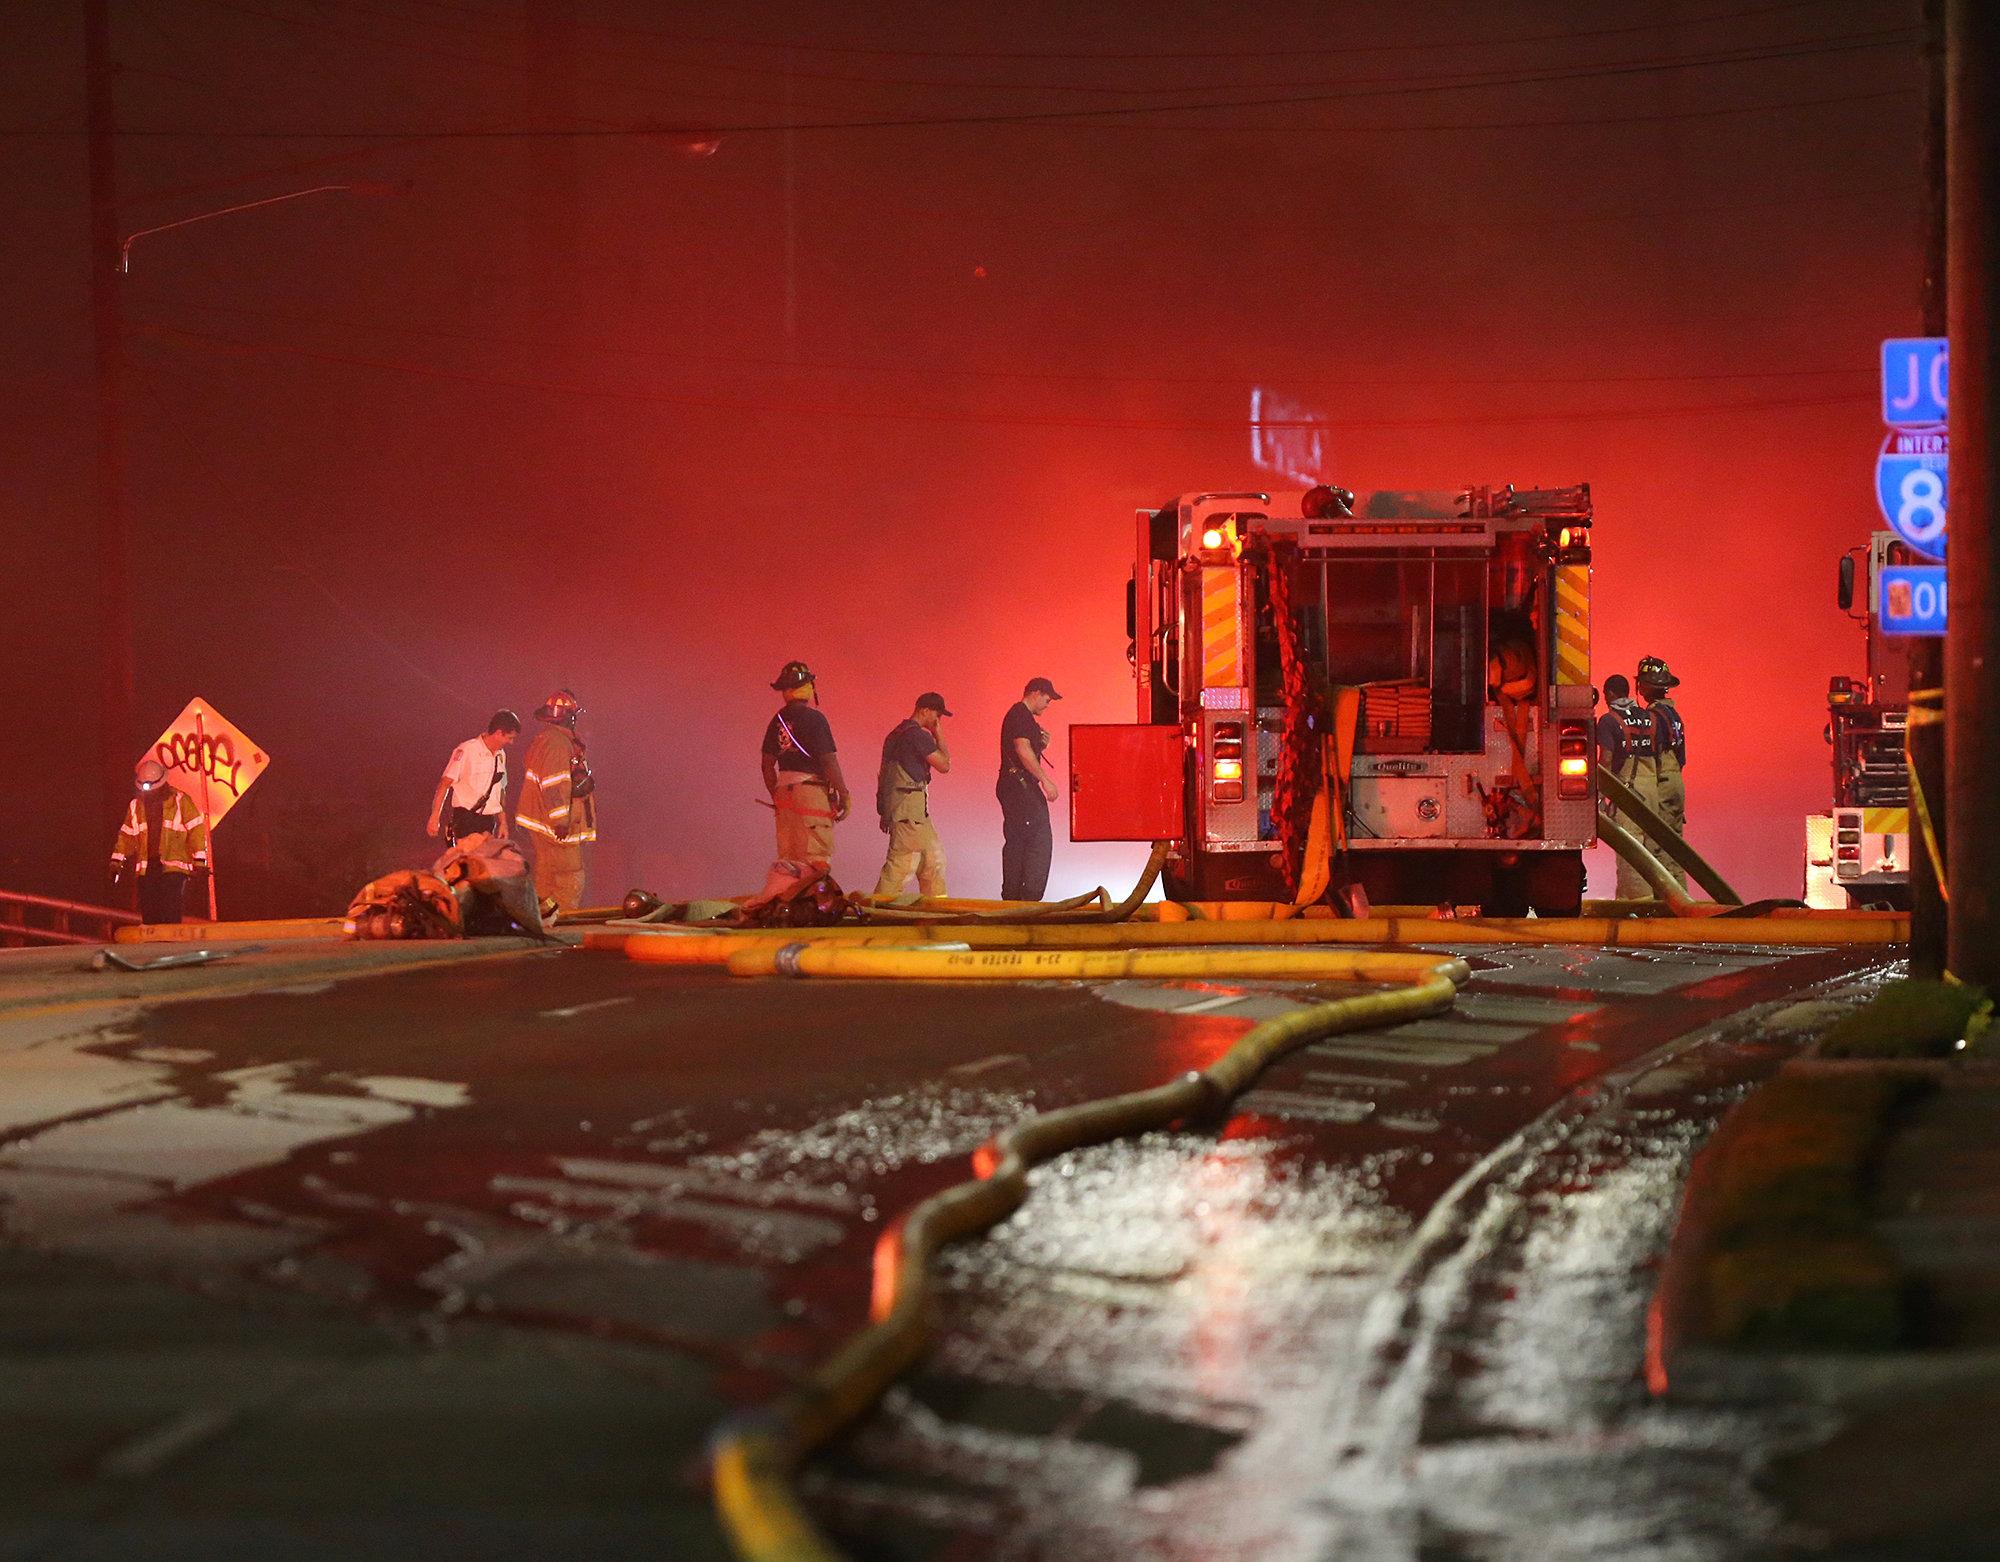 Emergency personnel work the scene of a bridge collapse at I-85 in Atlanta, Georgia, U.S., March 30, 2017.  (Courtesy  Curtis Compton/Atlanta Journal-Constitution/Handout via REUTERS)